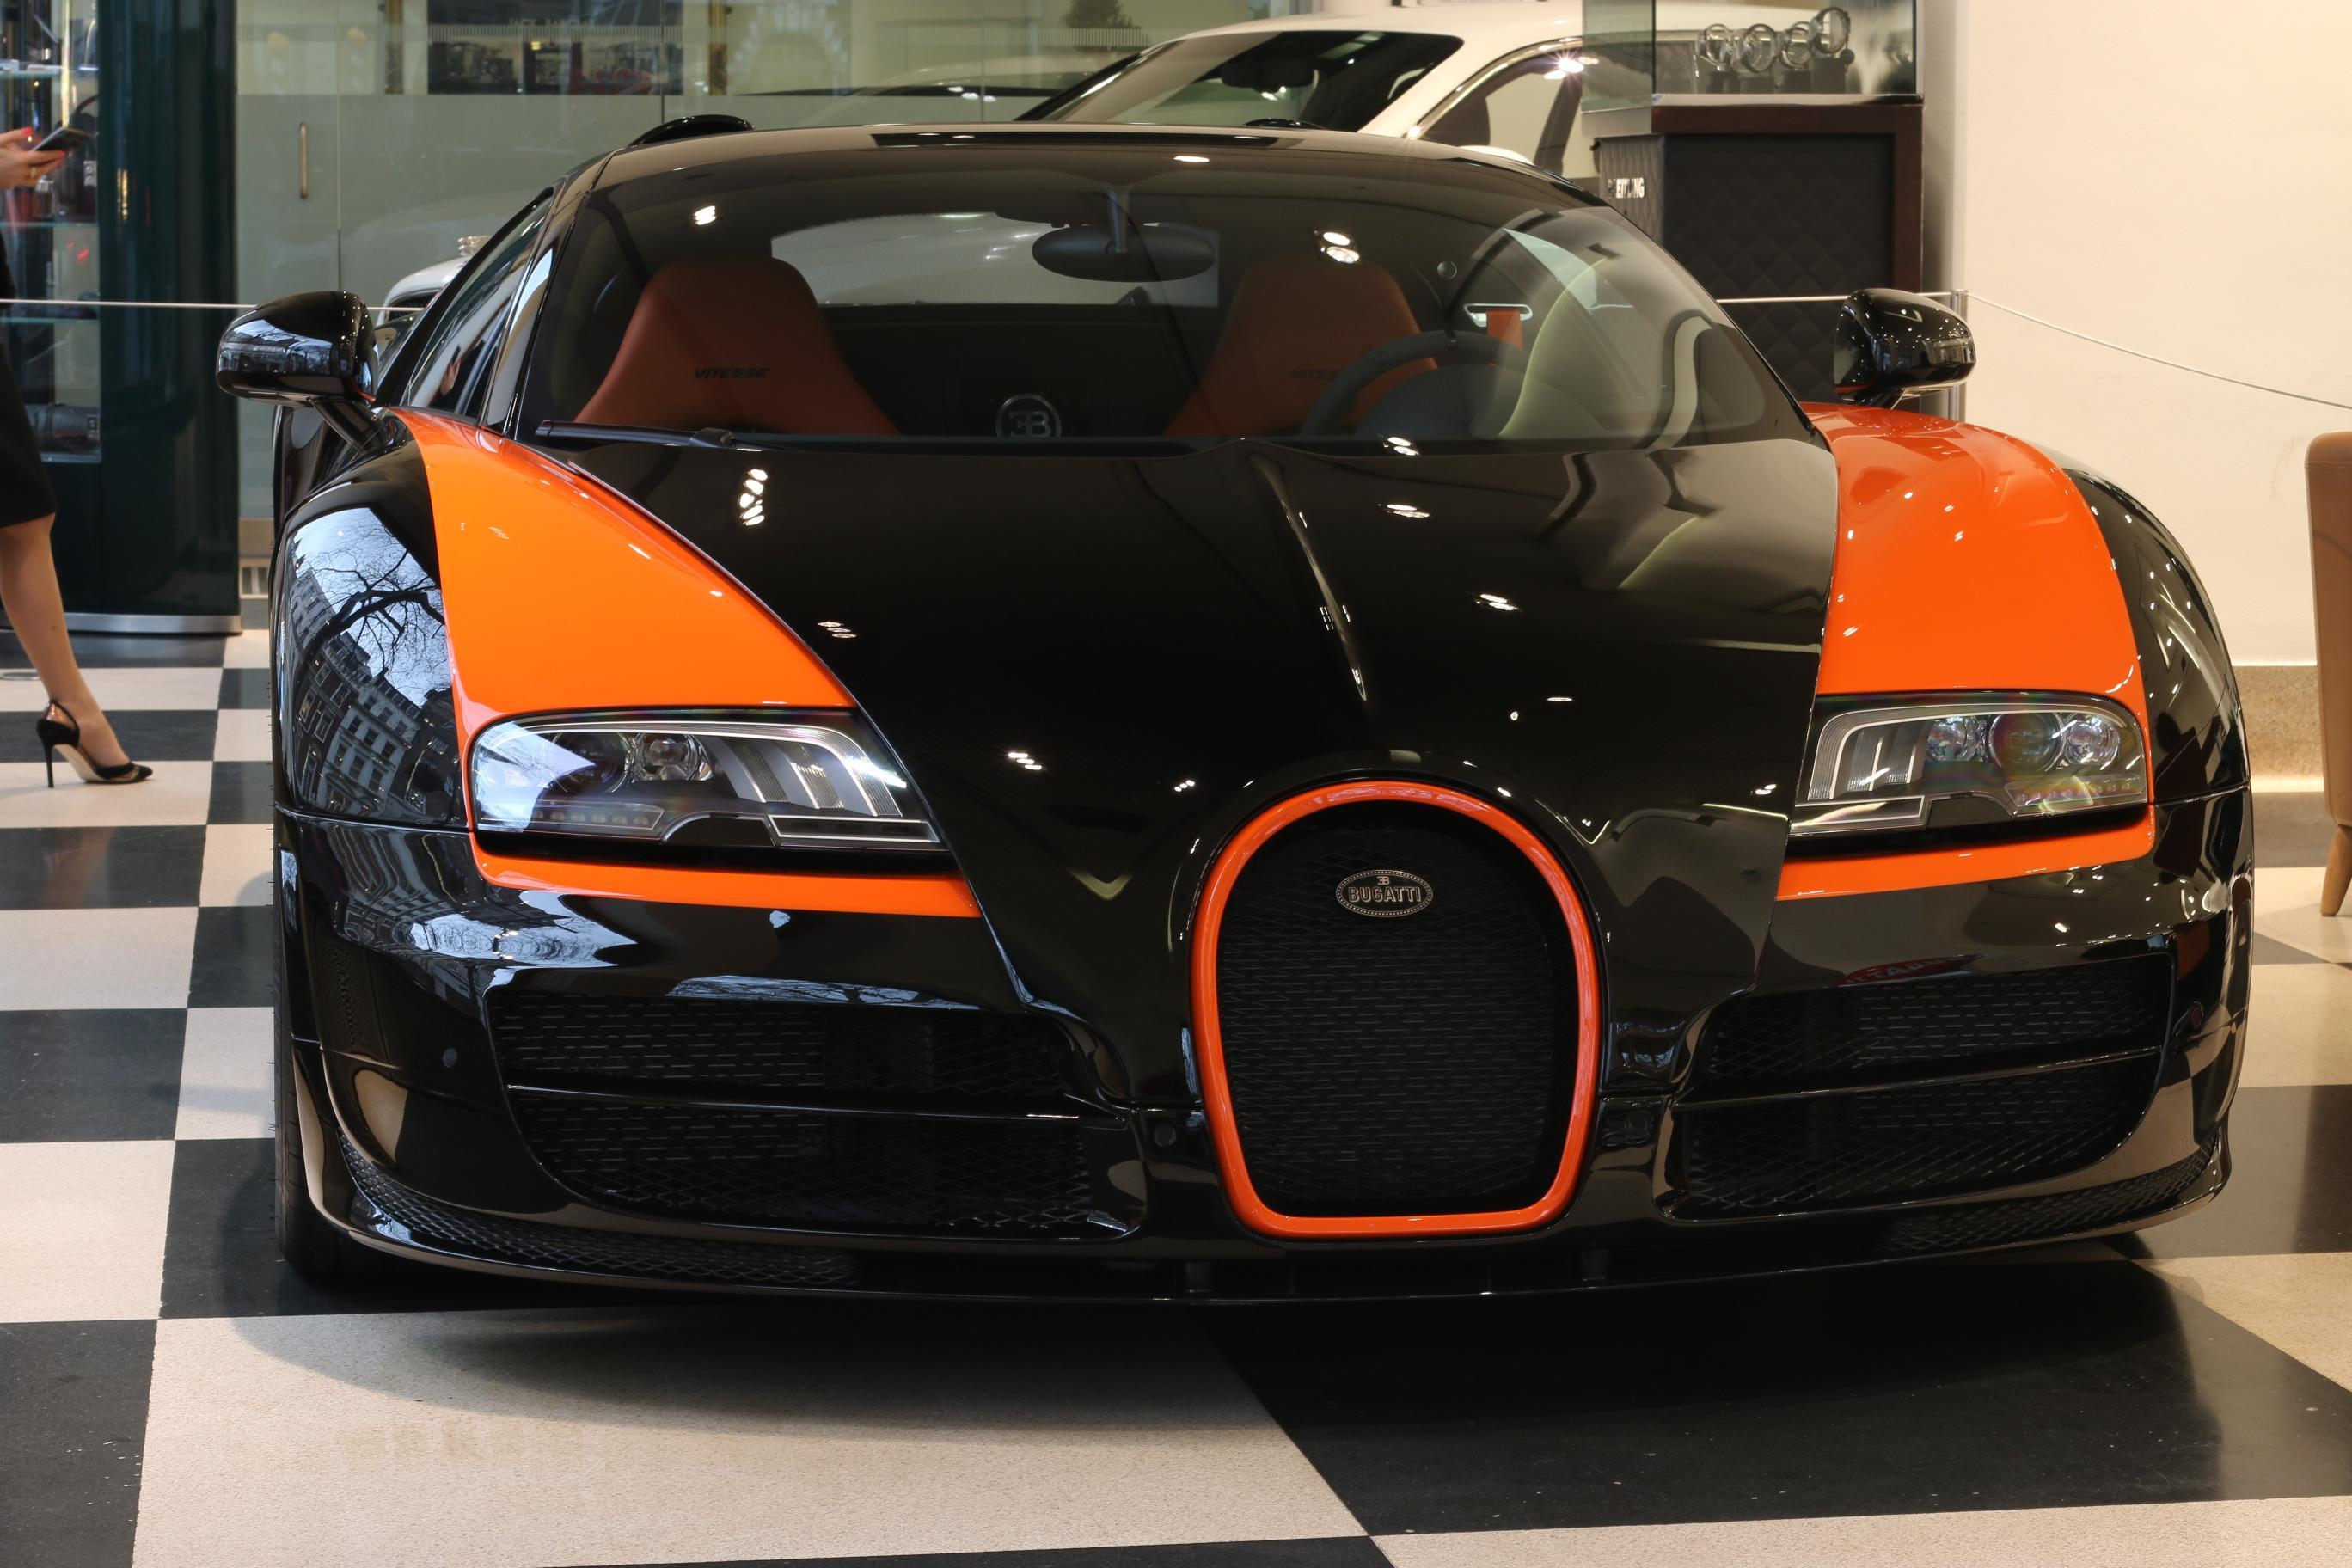 Bugatti-Veyron-Grand-Sport-Vitesse-WRC-10 Terrific New Bugatti Veyron Grand Sport Vitesse Cars Trend